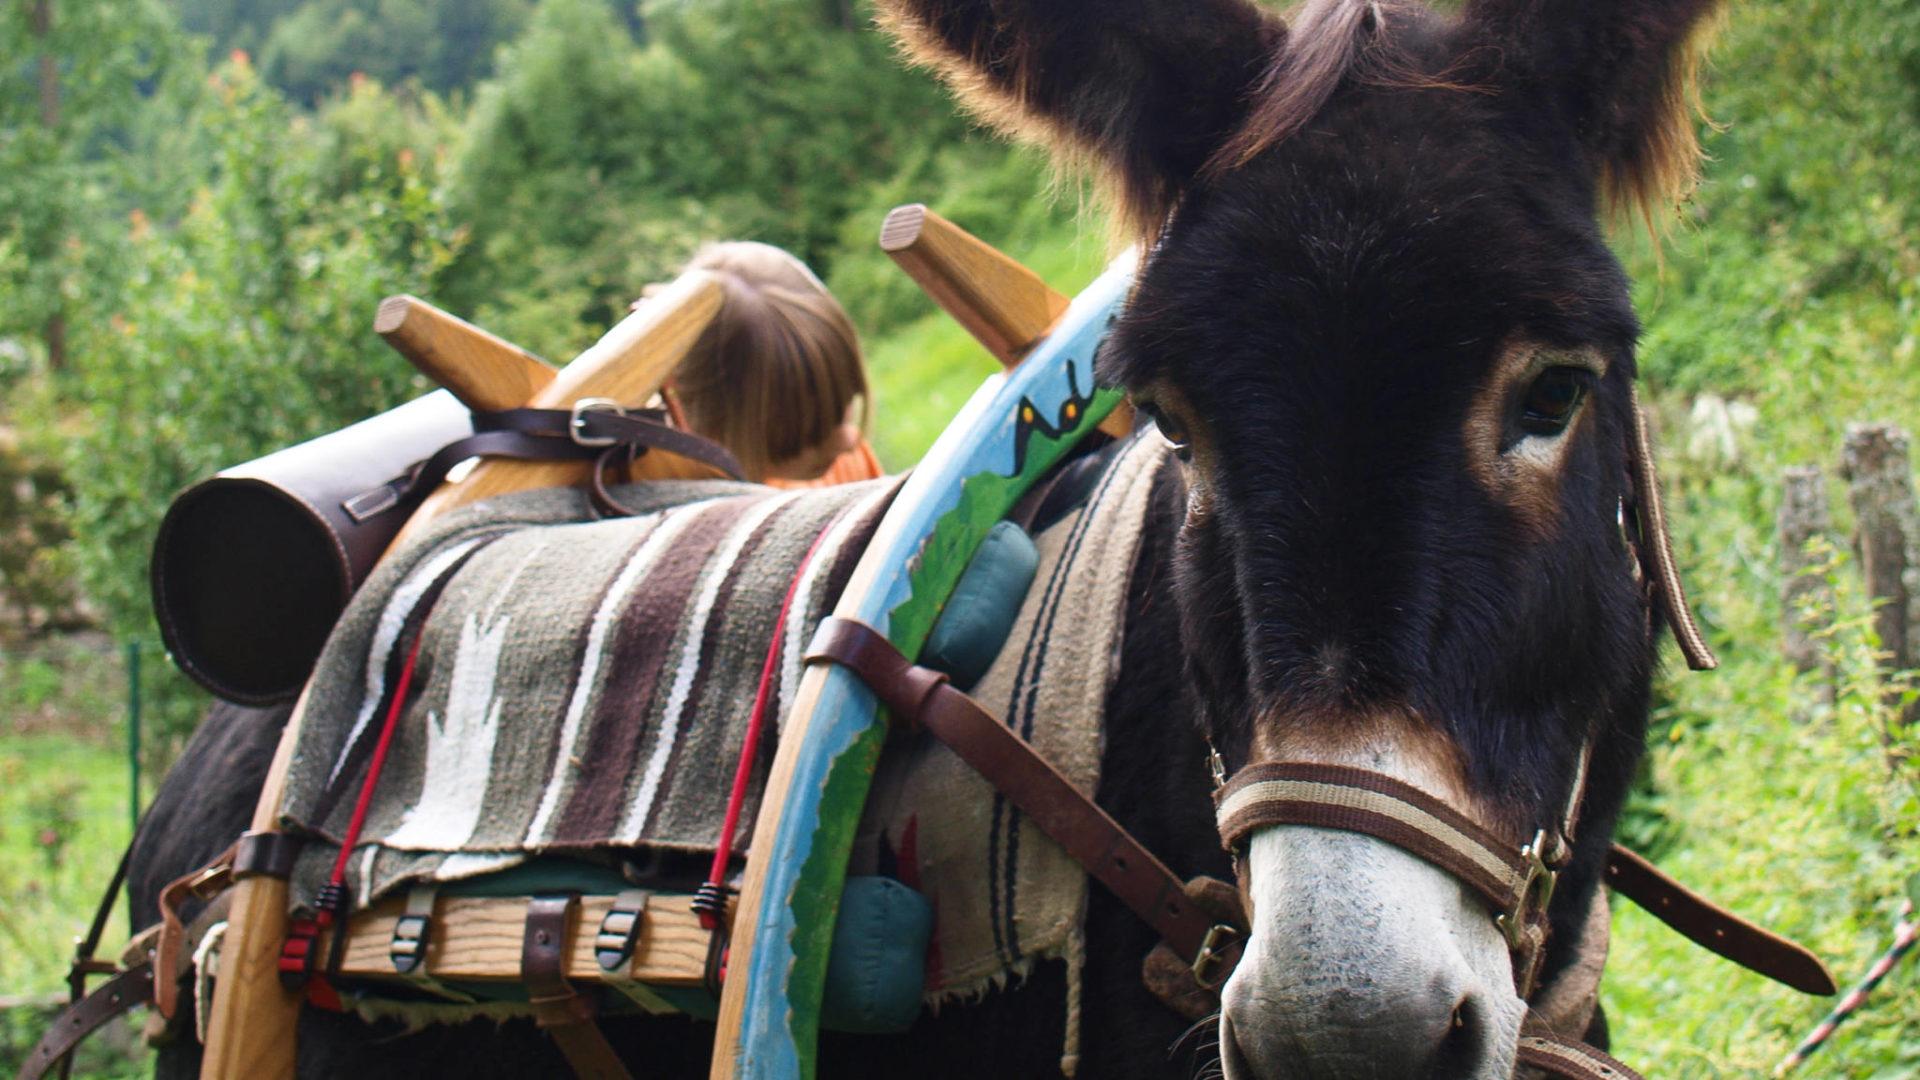 Nos adorables compagnons les ânes...